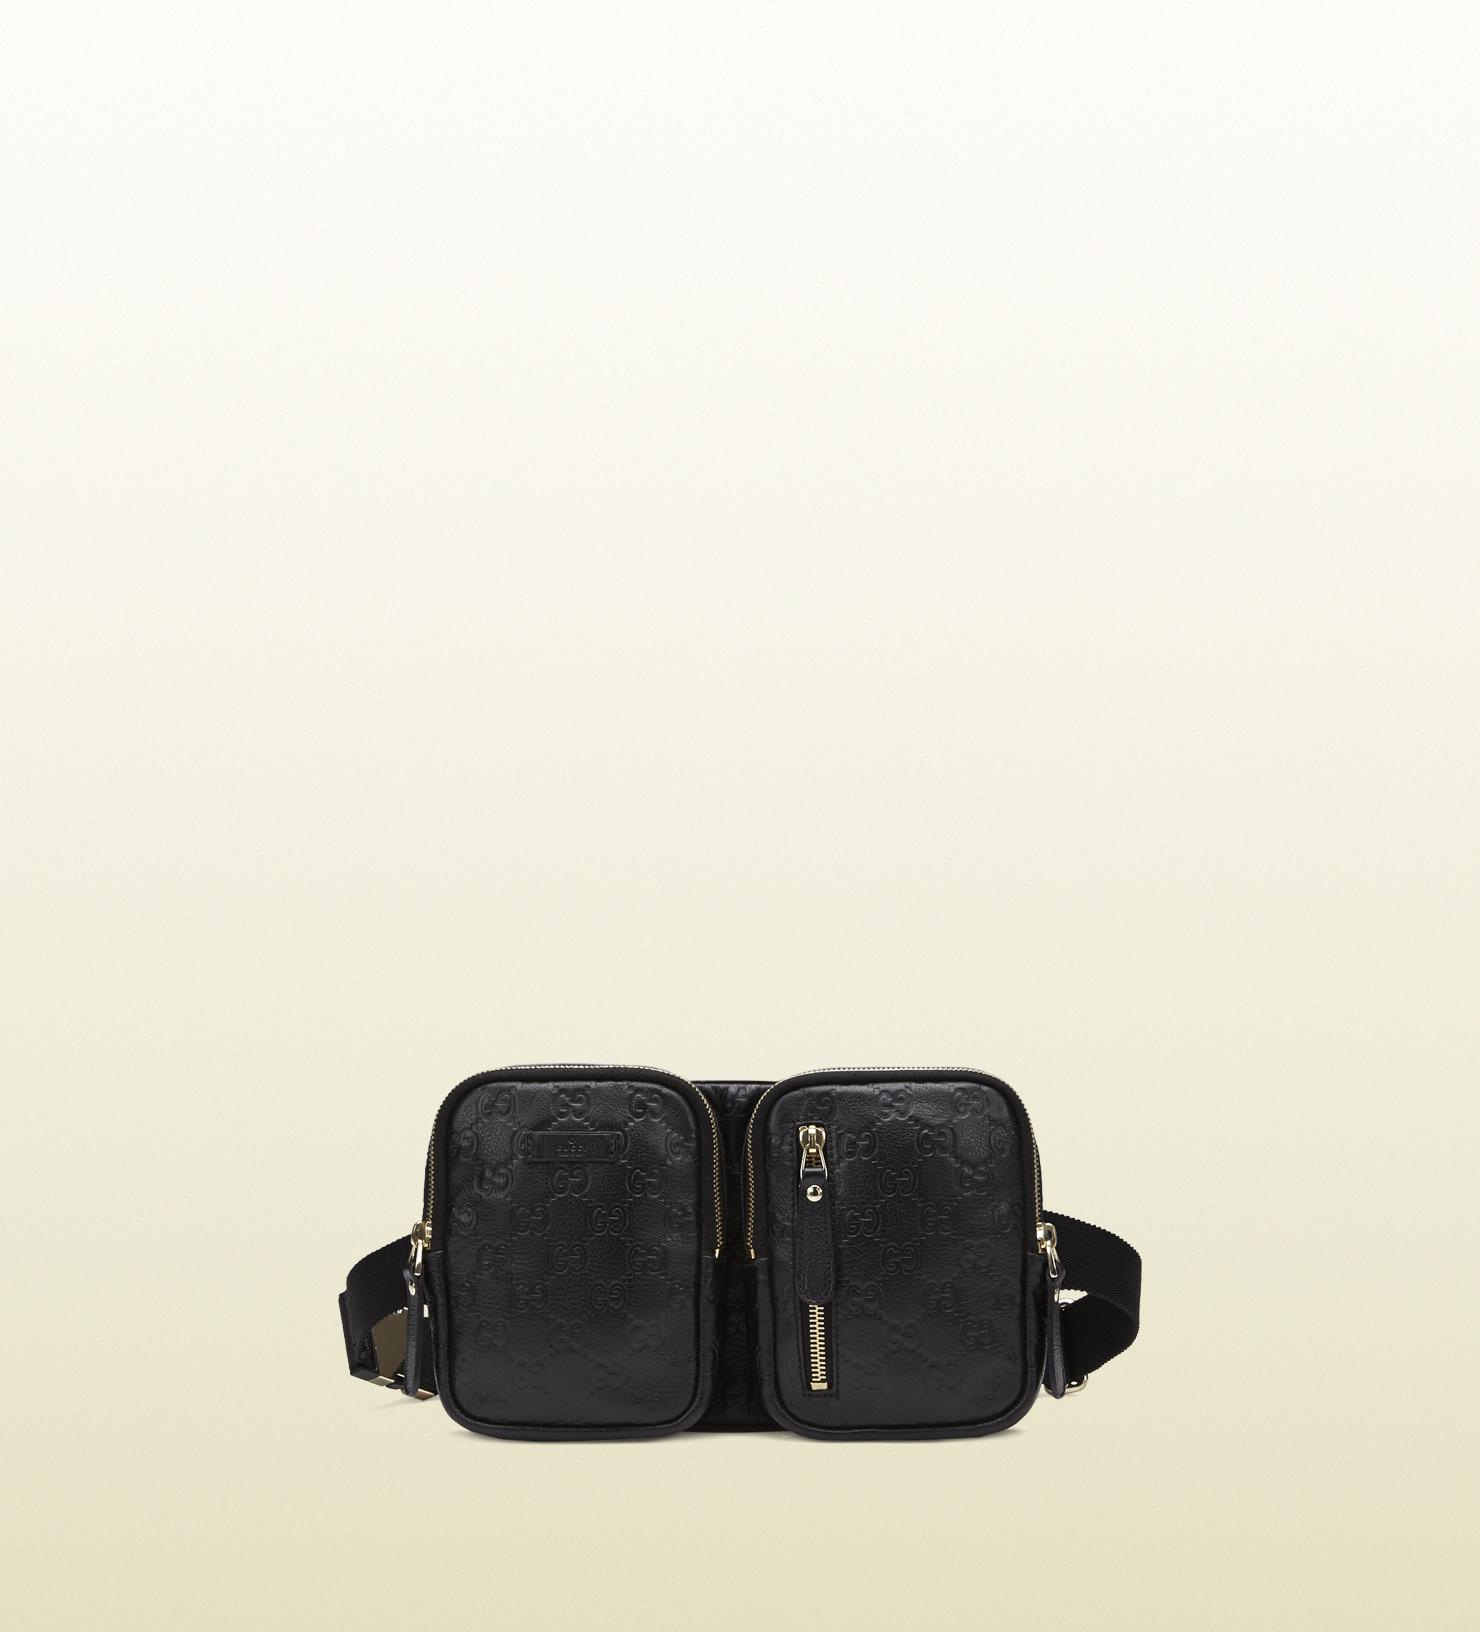 c68c02c4a5a Gucci Black Ssima Leather Belt Bag in Black for Men - Lyst